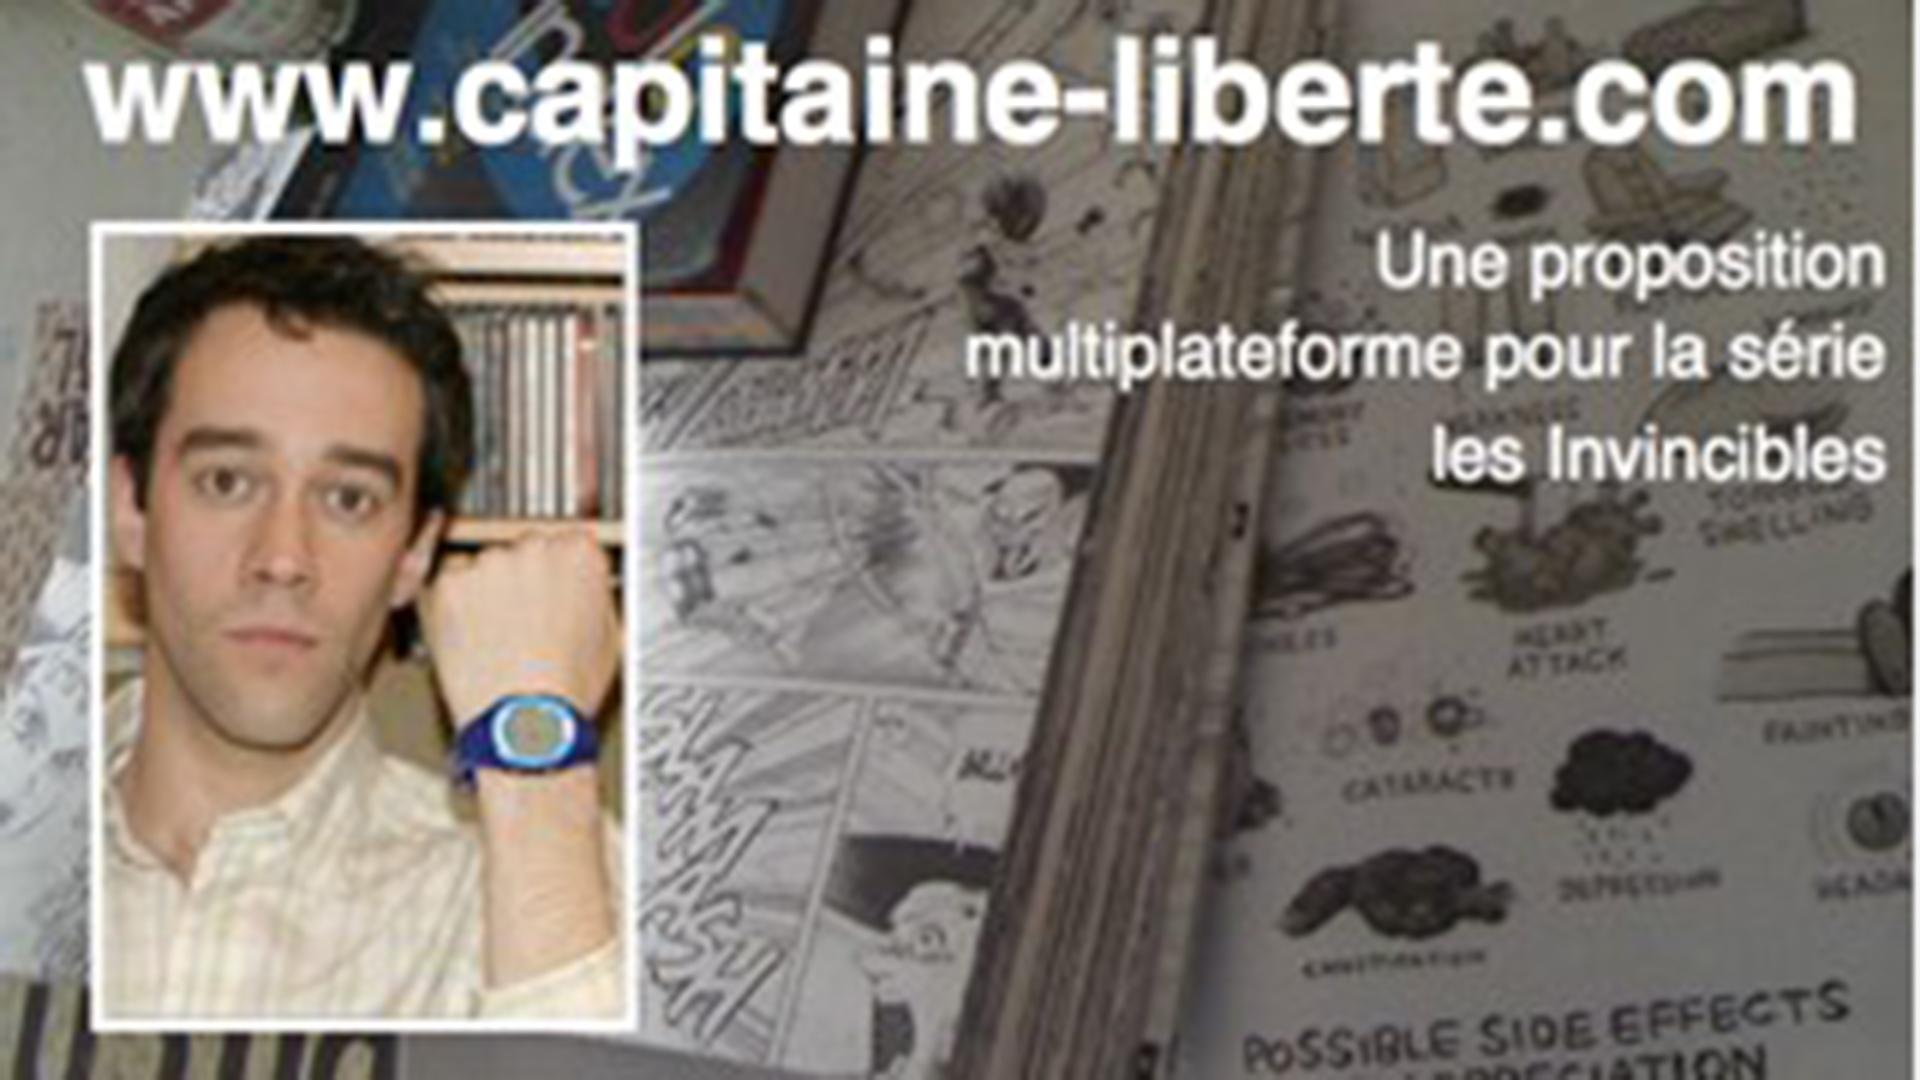 www.capitaine-liberté.com